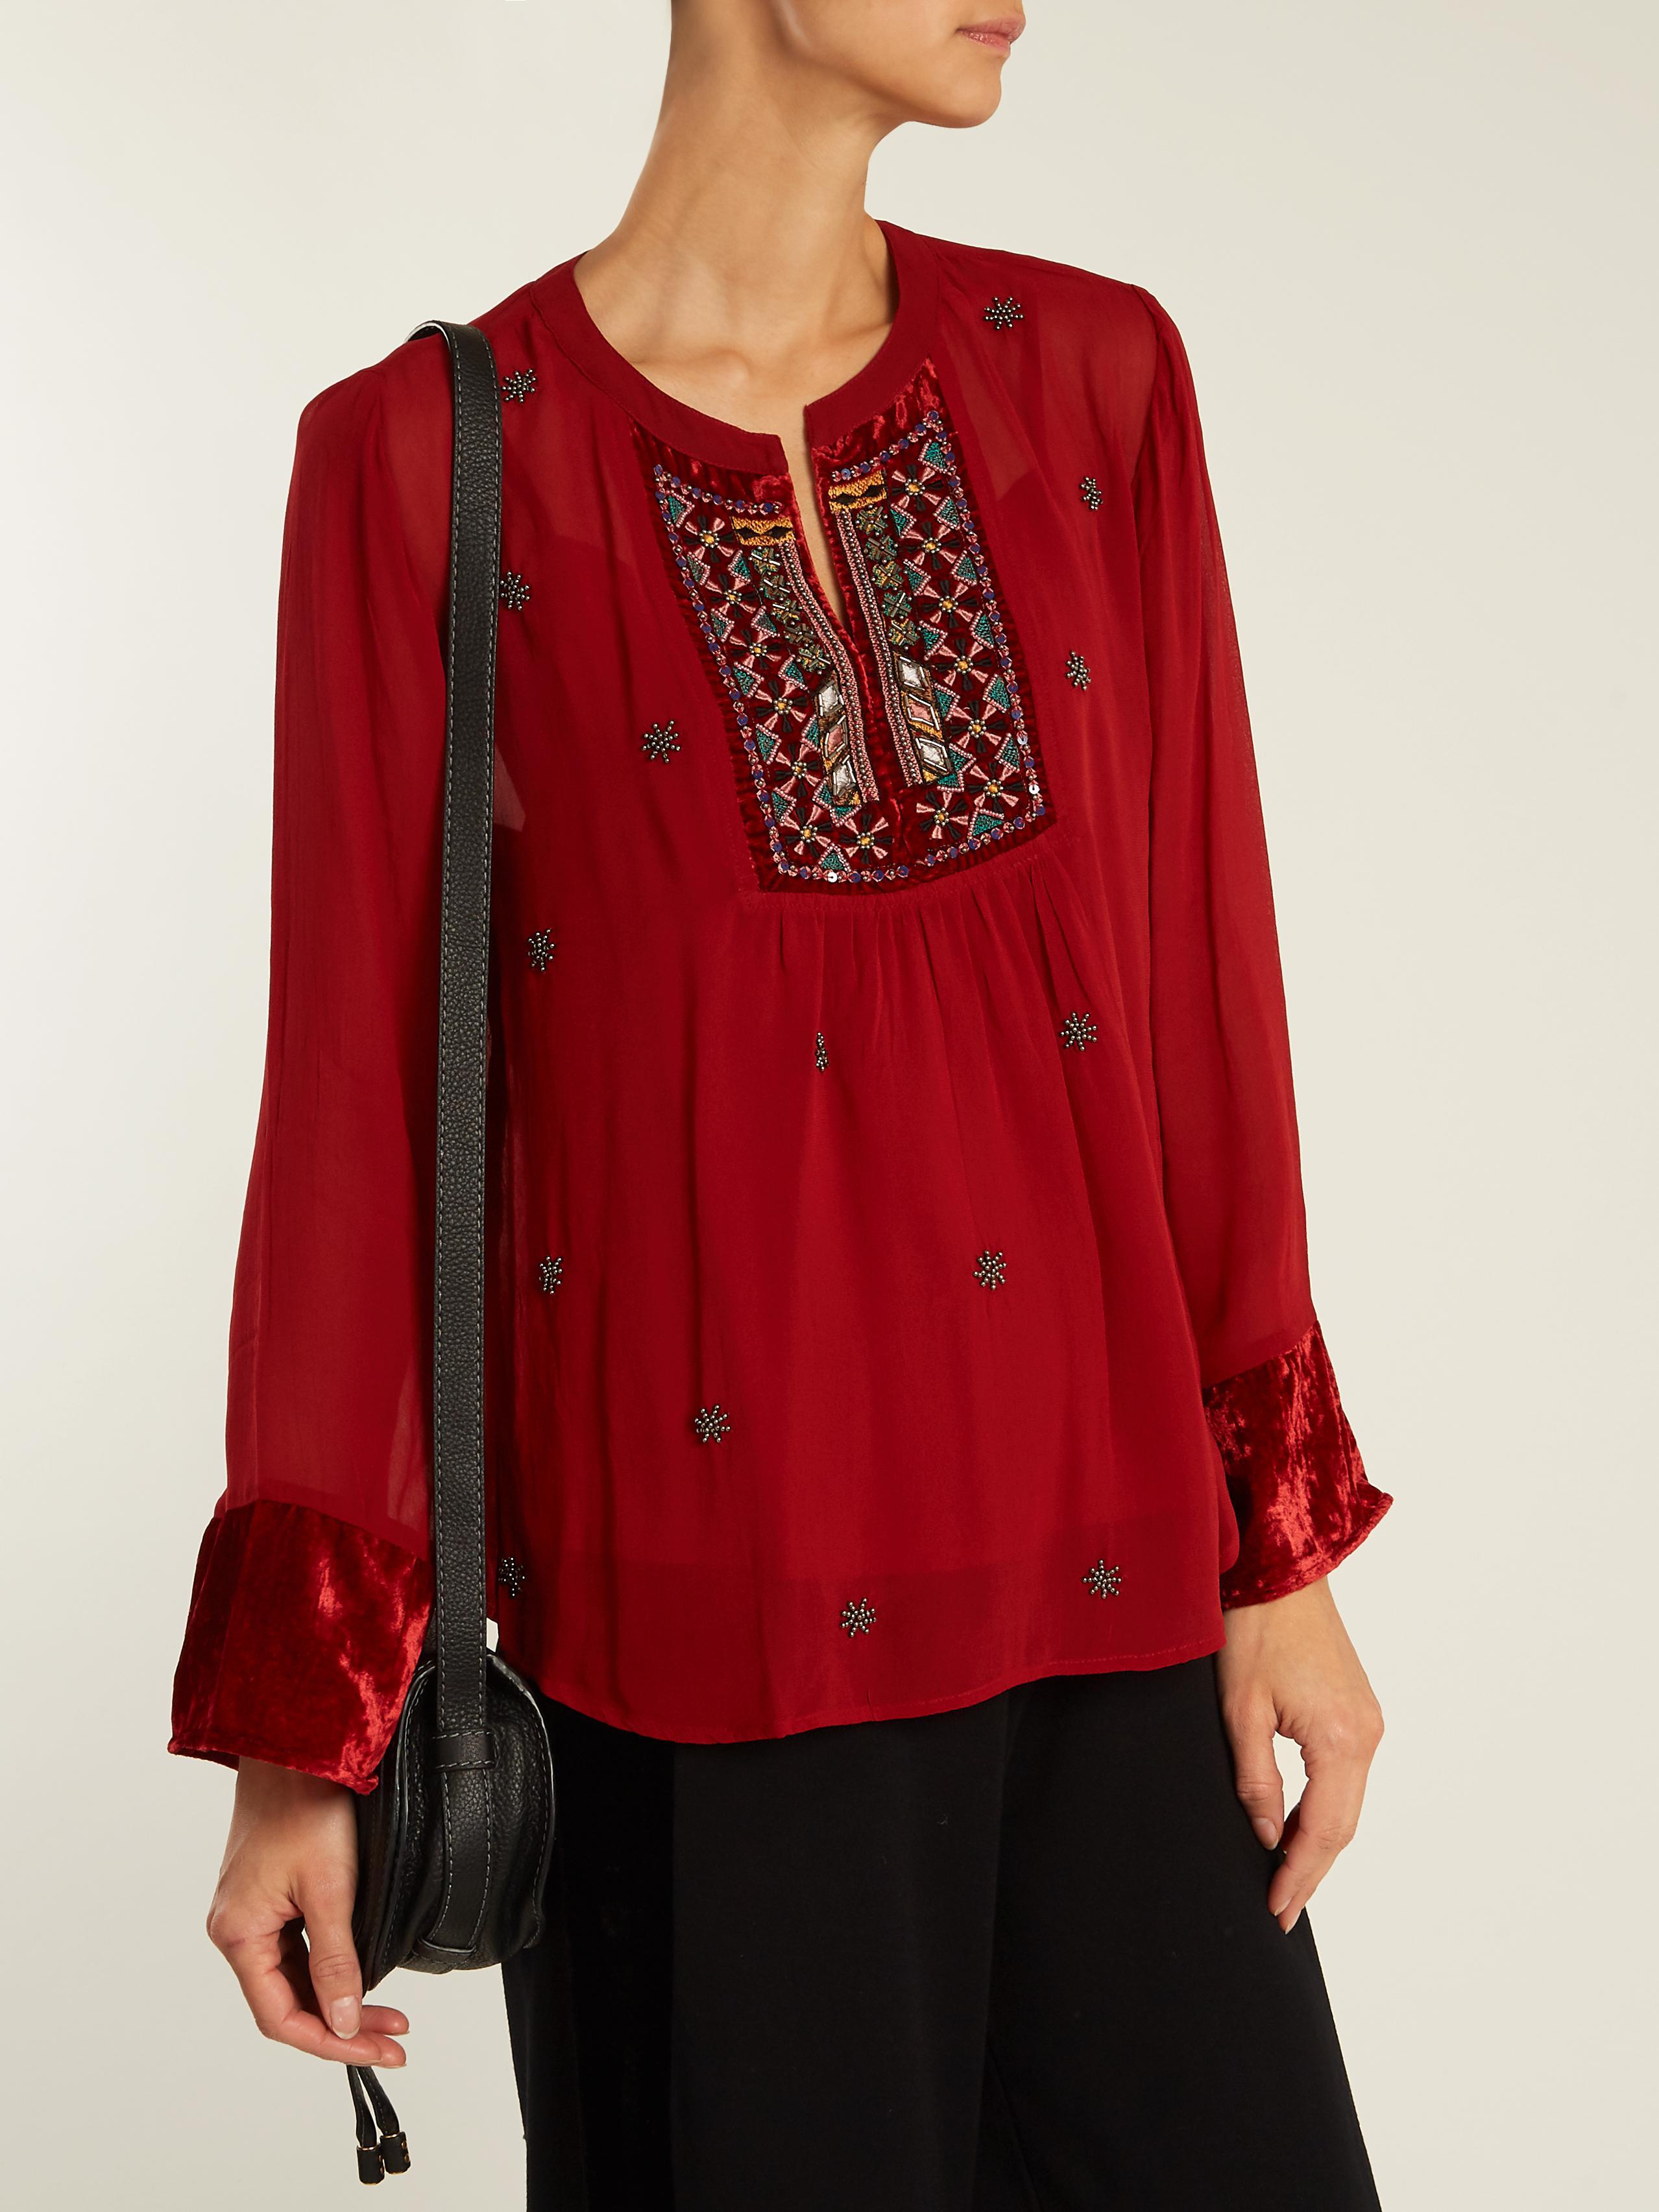 Becky embellished chiffon blouse Velvet Buy Online Cheap Outlet Fake ldywzT